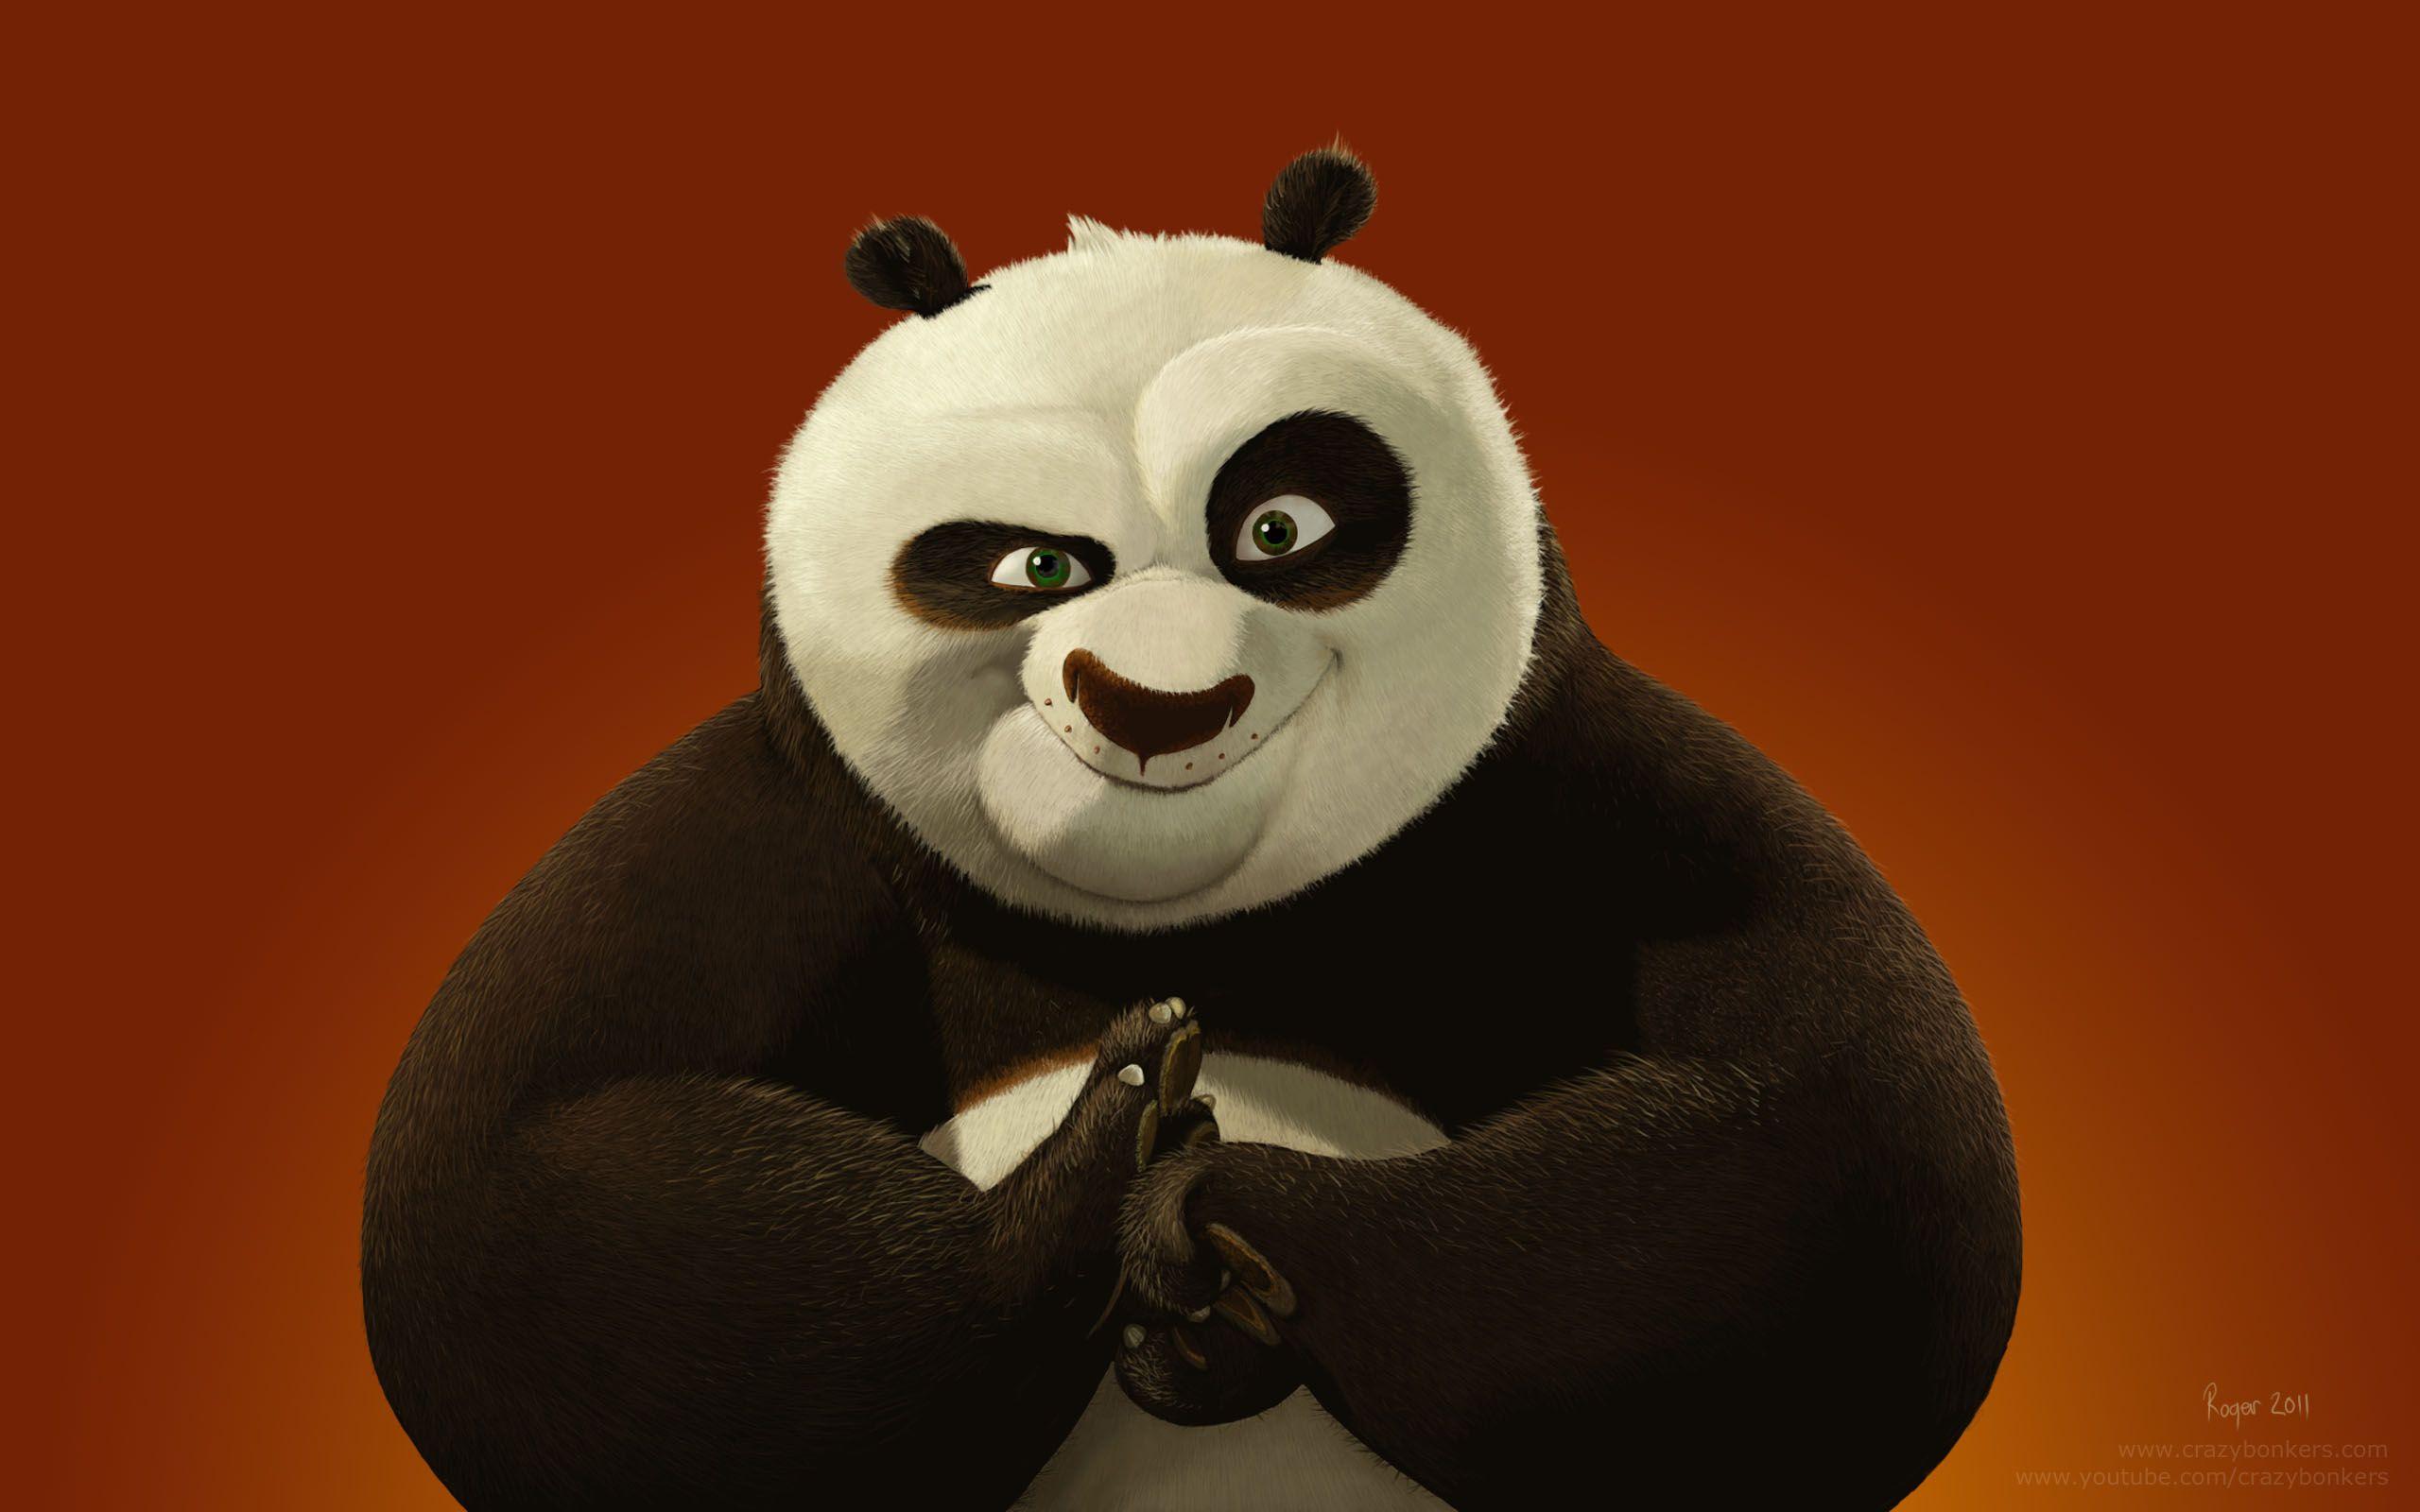 Картинки котов, прикольные картинки кунг фу панда